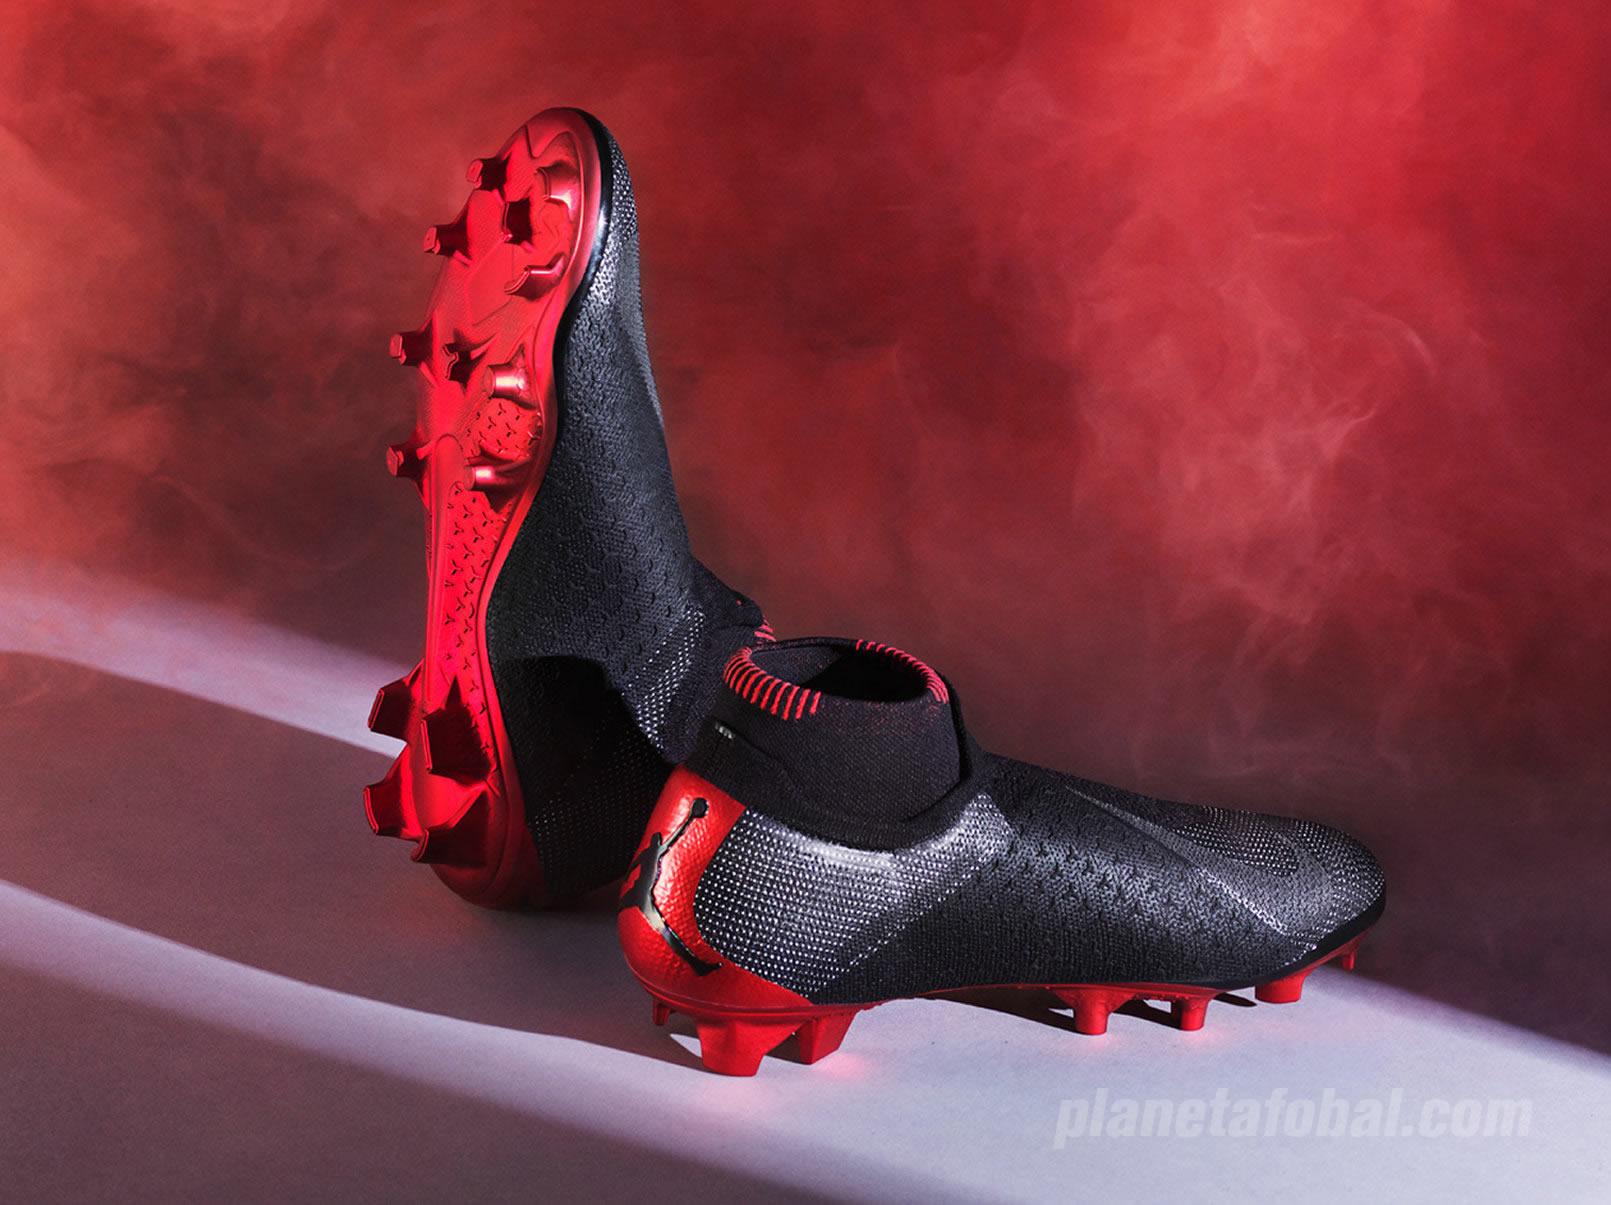 Botines Jordan Brand x Paris Saint-Germain PhantomVSN | Imagen Nike